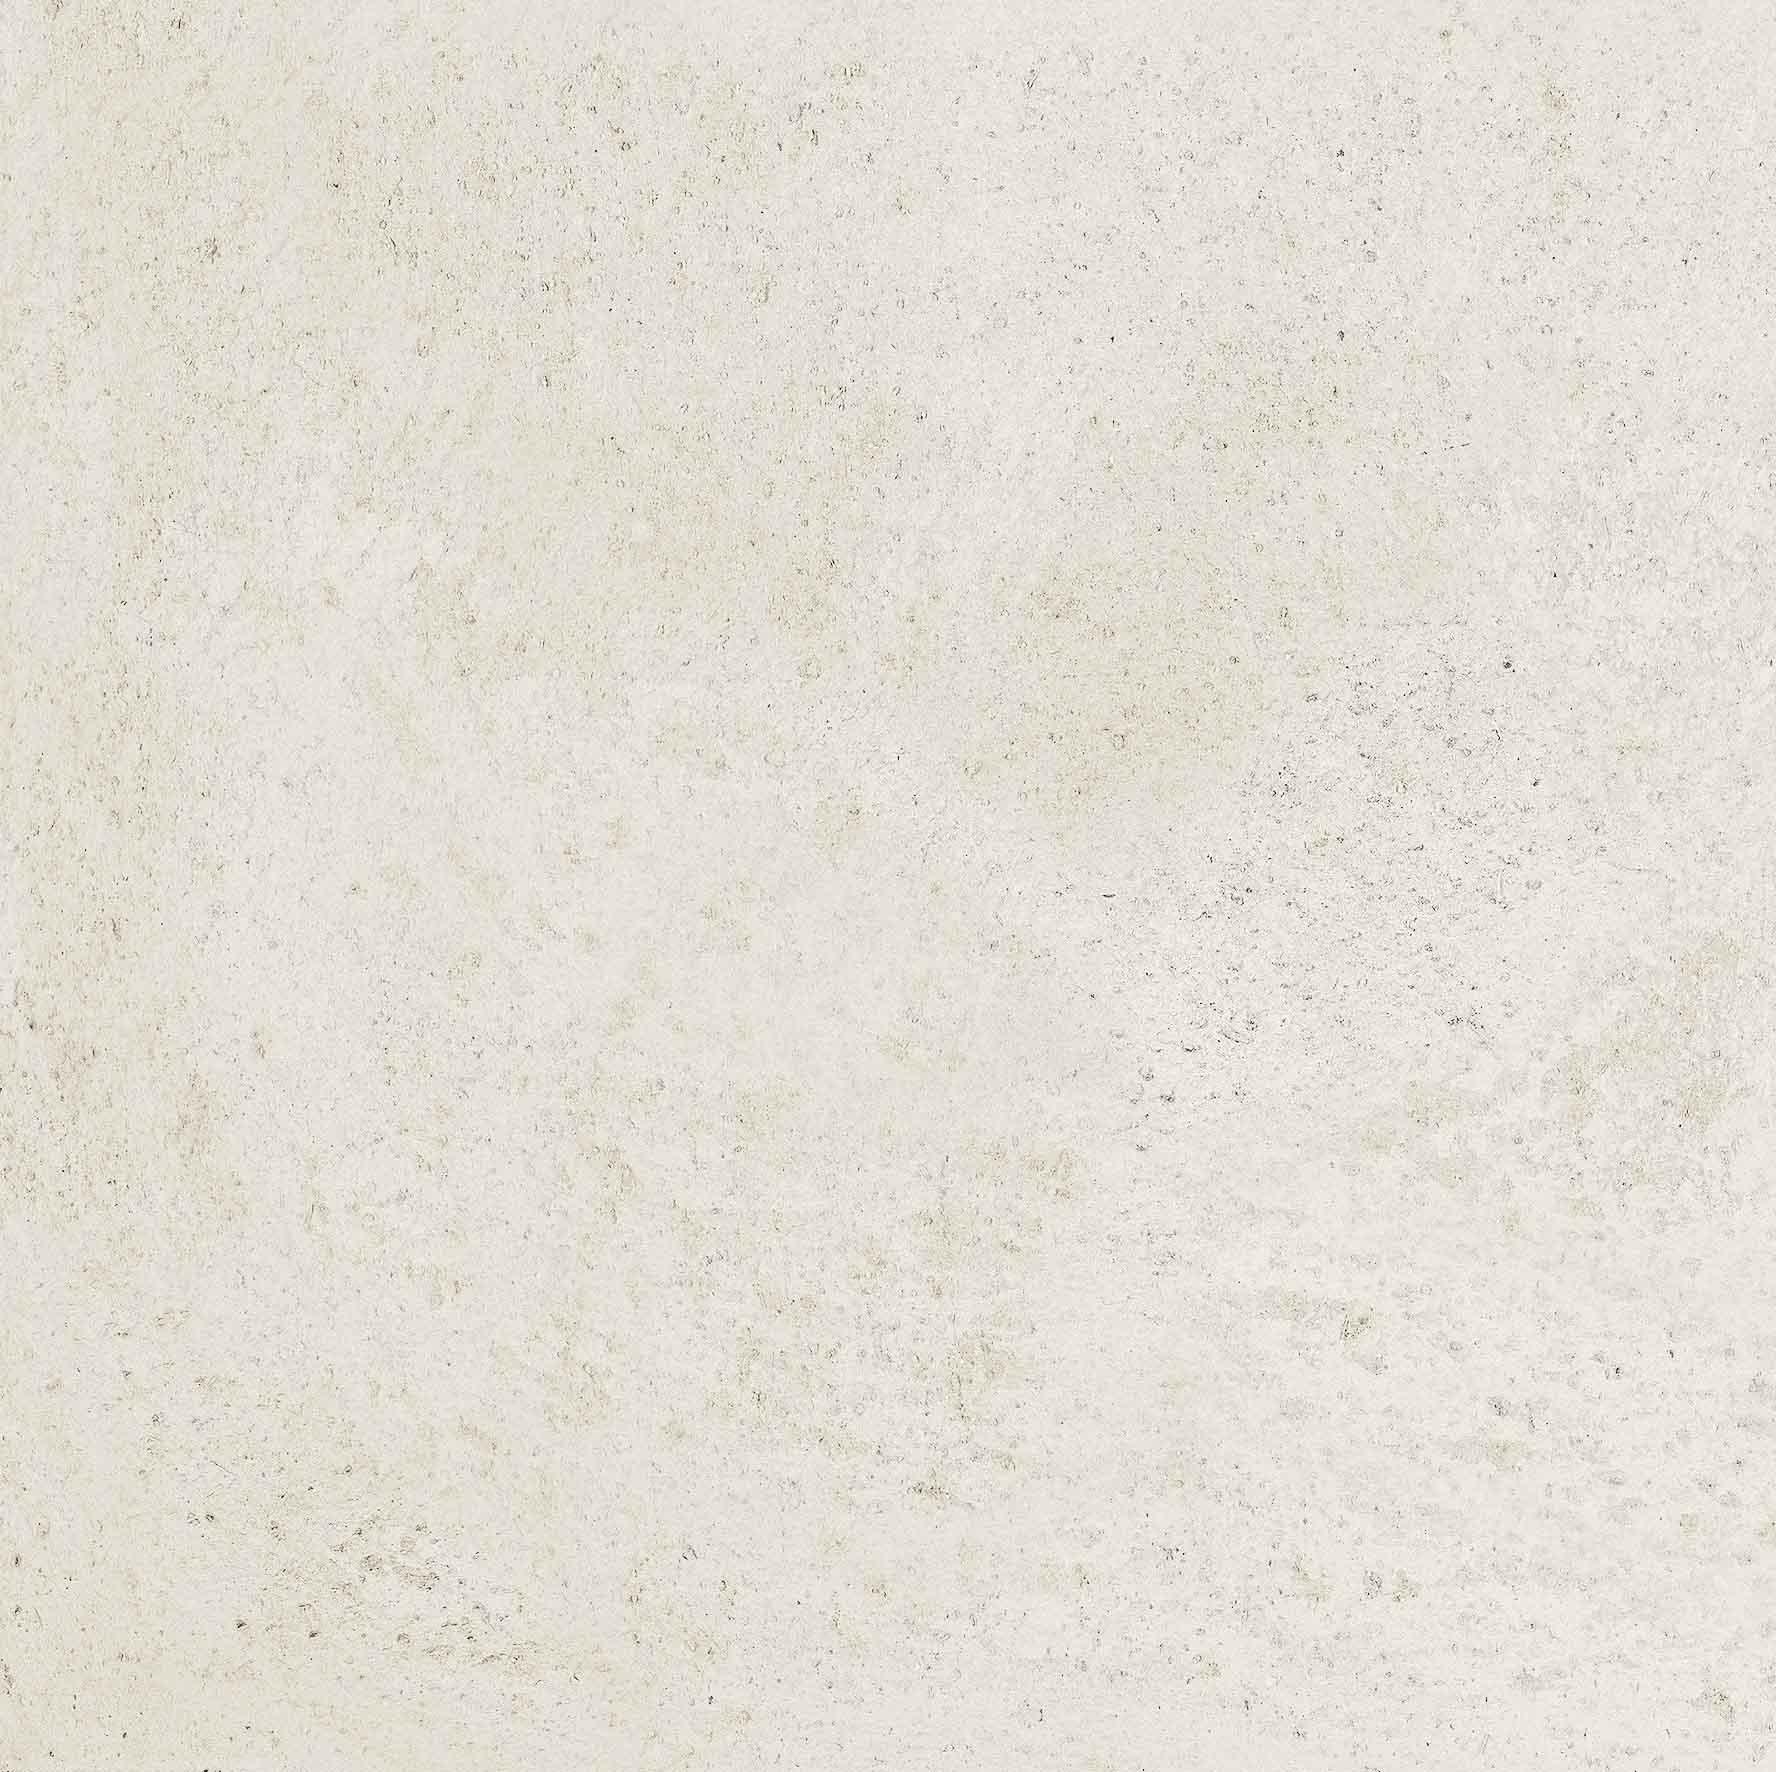 Maps of Cerim White Matte 10mm 60 x 60